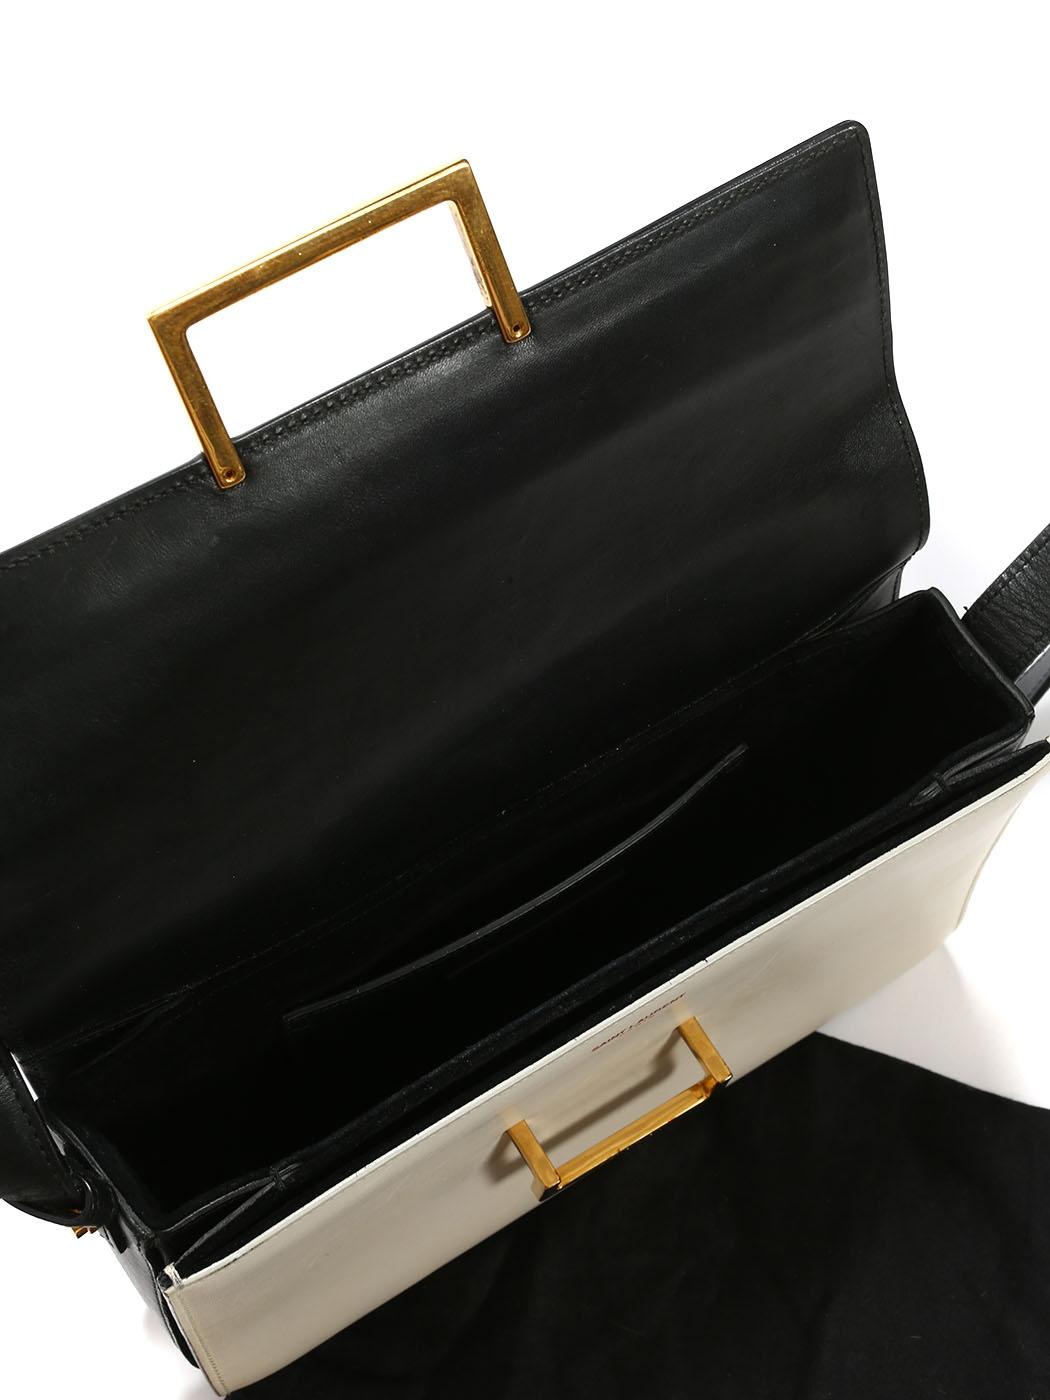 ... SAINT LAURENT LULU Medium black and white leather shoulder bag Retail  price €1500 ... 0bc1705b21db0